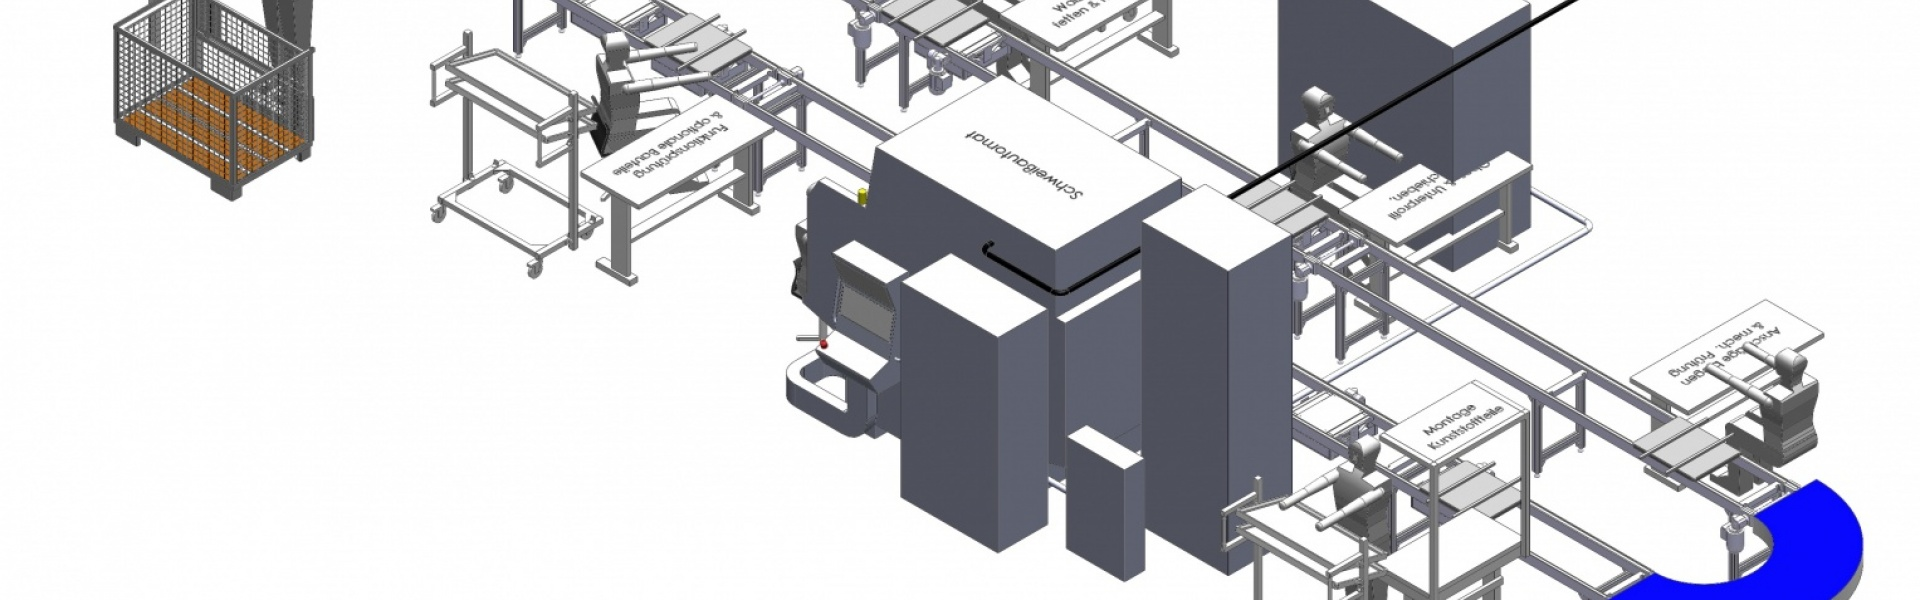 Konzeptkonstruktion Montagelinie